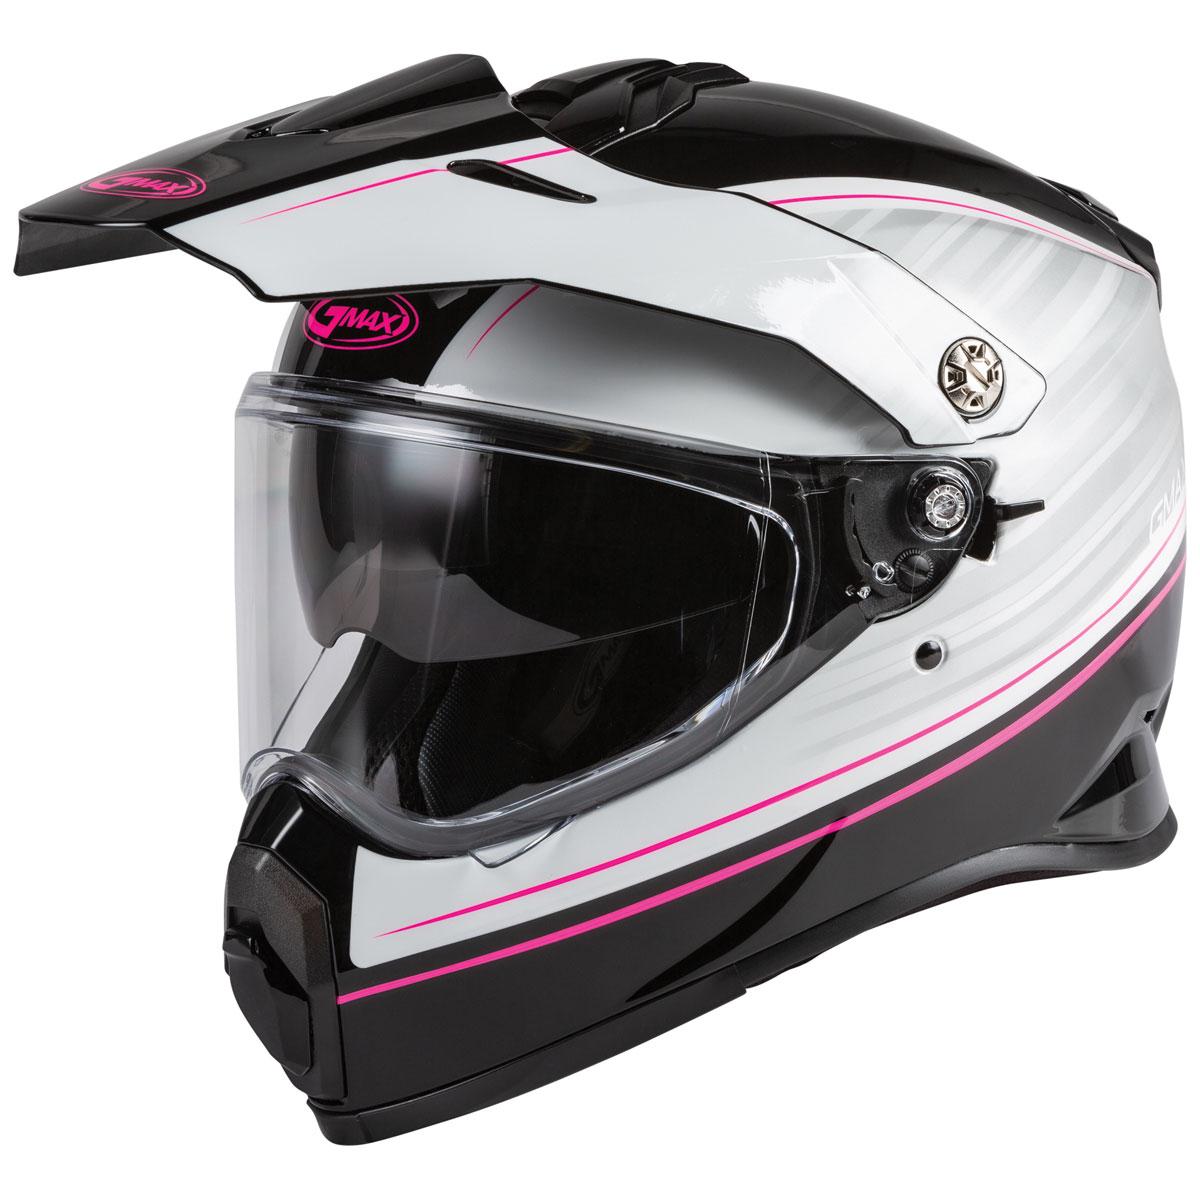 GMAX AT-21 Raley Black/White/Pink Dual Sport Helmet